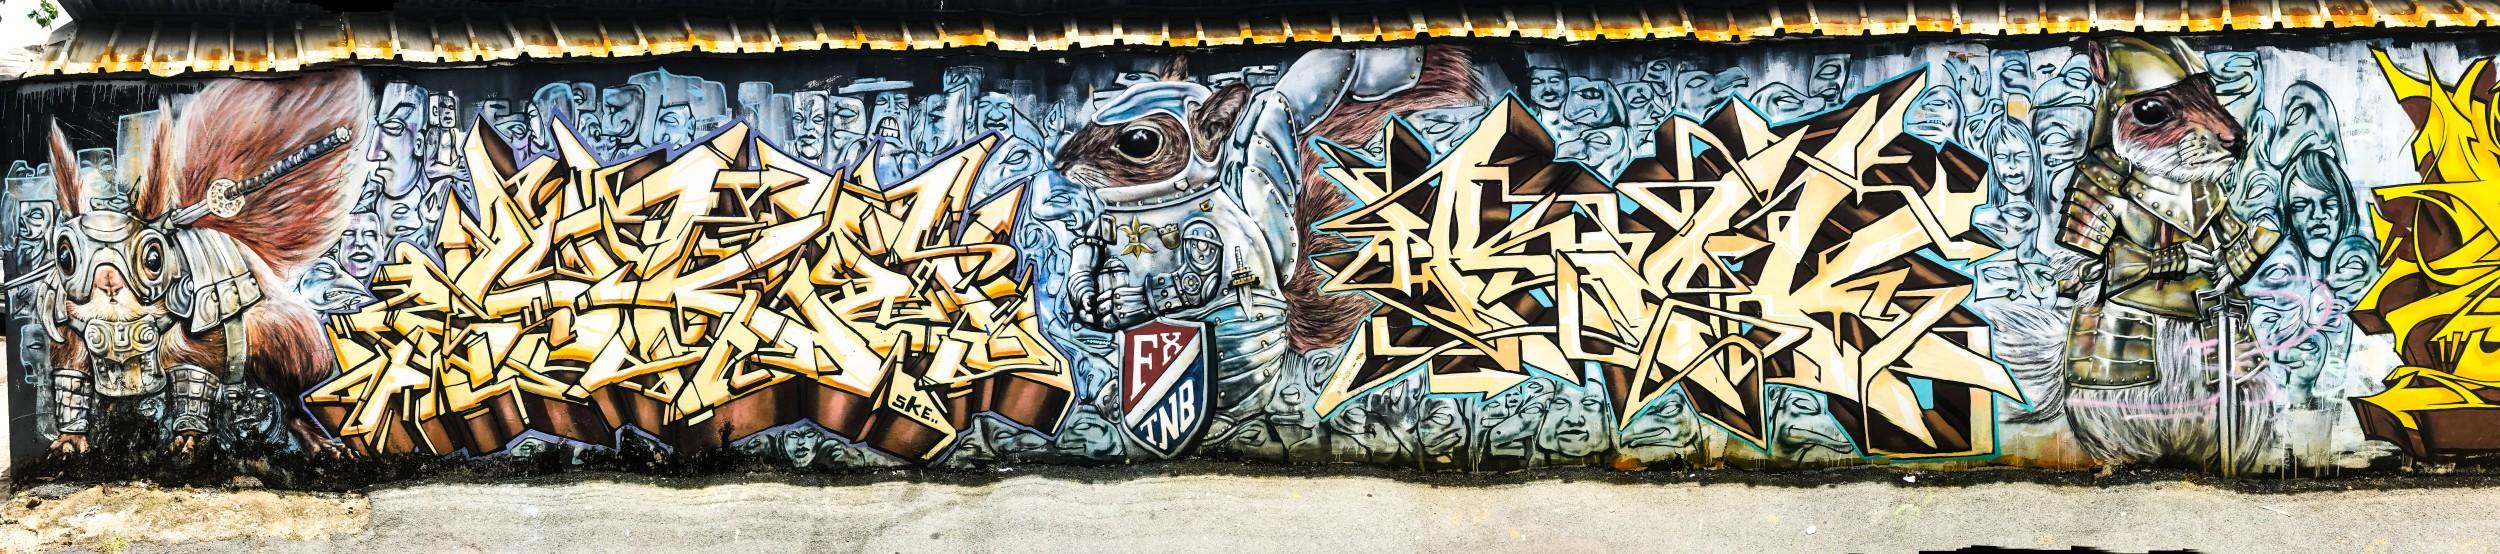 San Juan Graffiti Panoramic